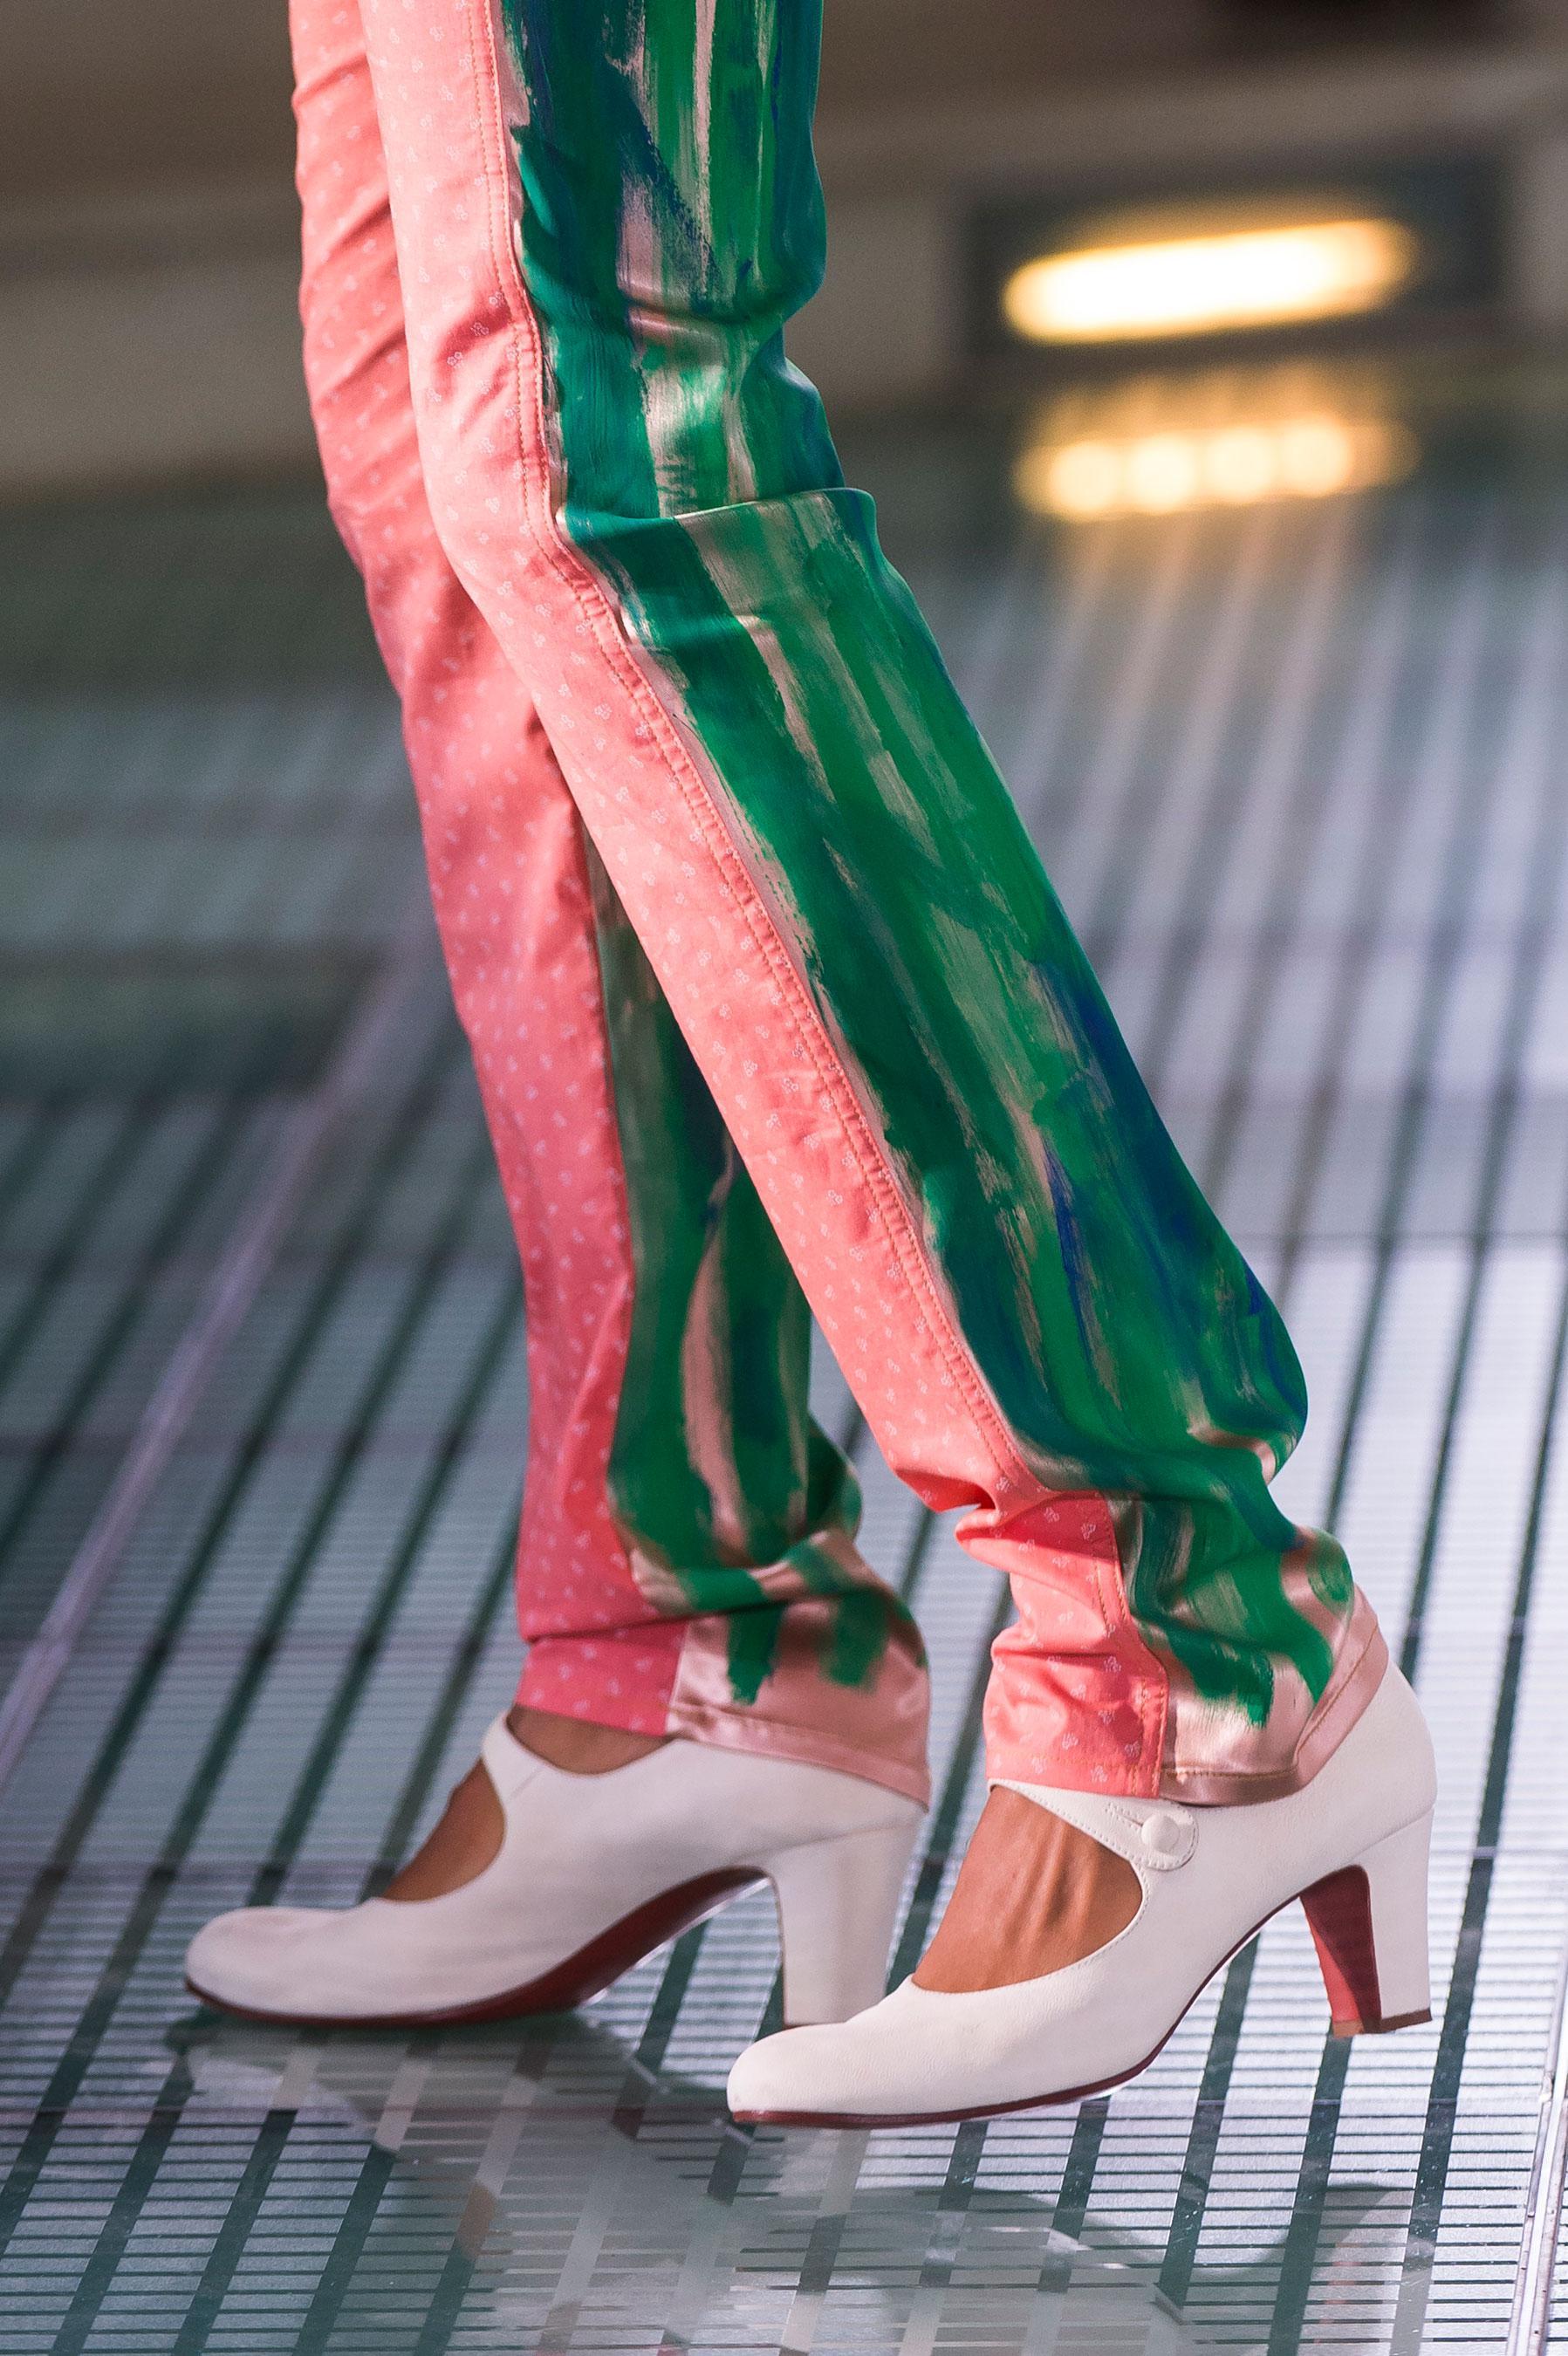 Vivienne Westwood весна лето 2018 белые туфли